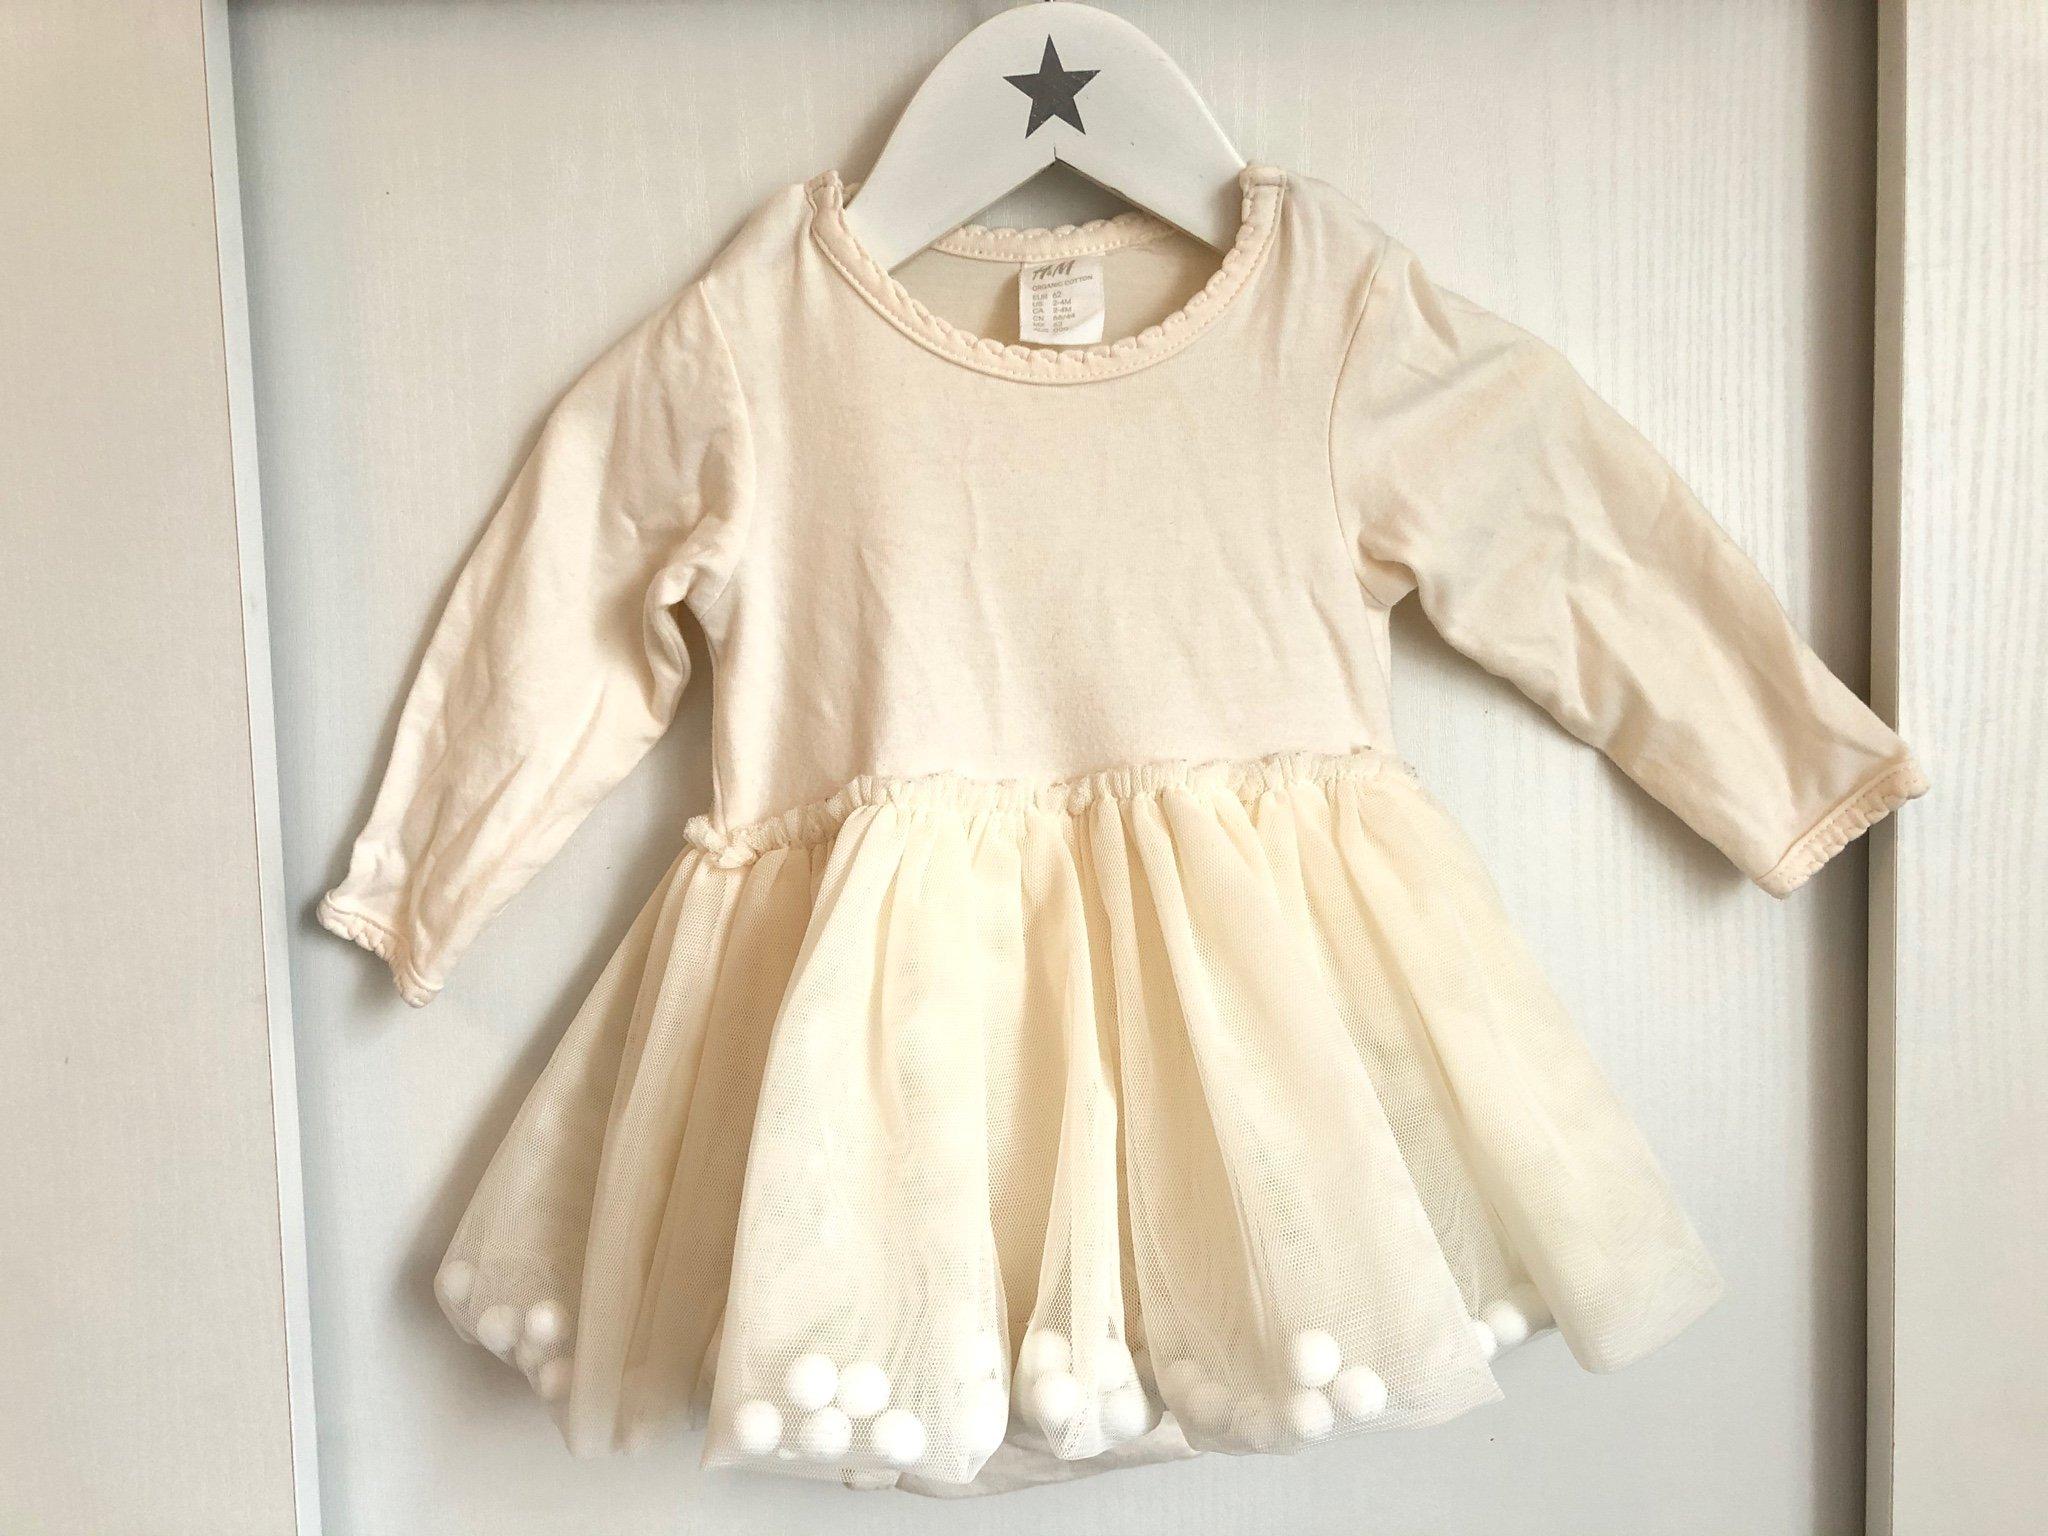 Söt klänning tyll bollar stl 62 H&M, cremefärgadljusgul body